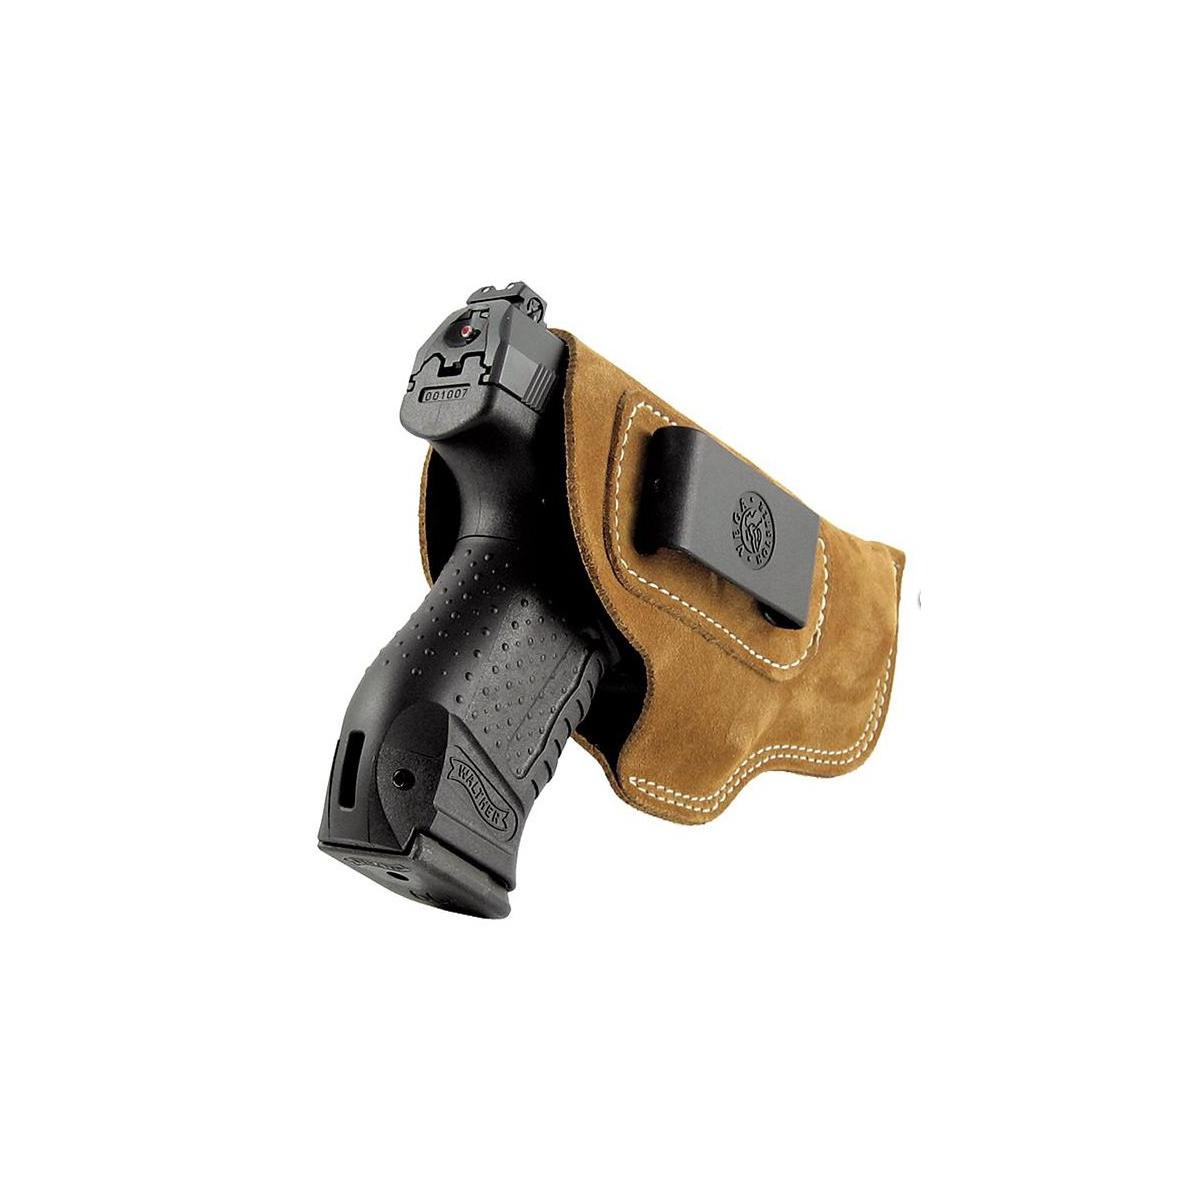 23// 38// 32 45 KING HOLSTER Concealed IWB Retention Gun Holster fits GLOCK 19